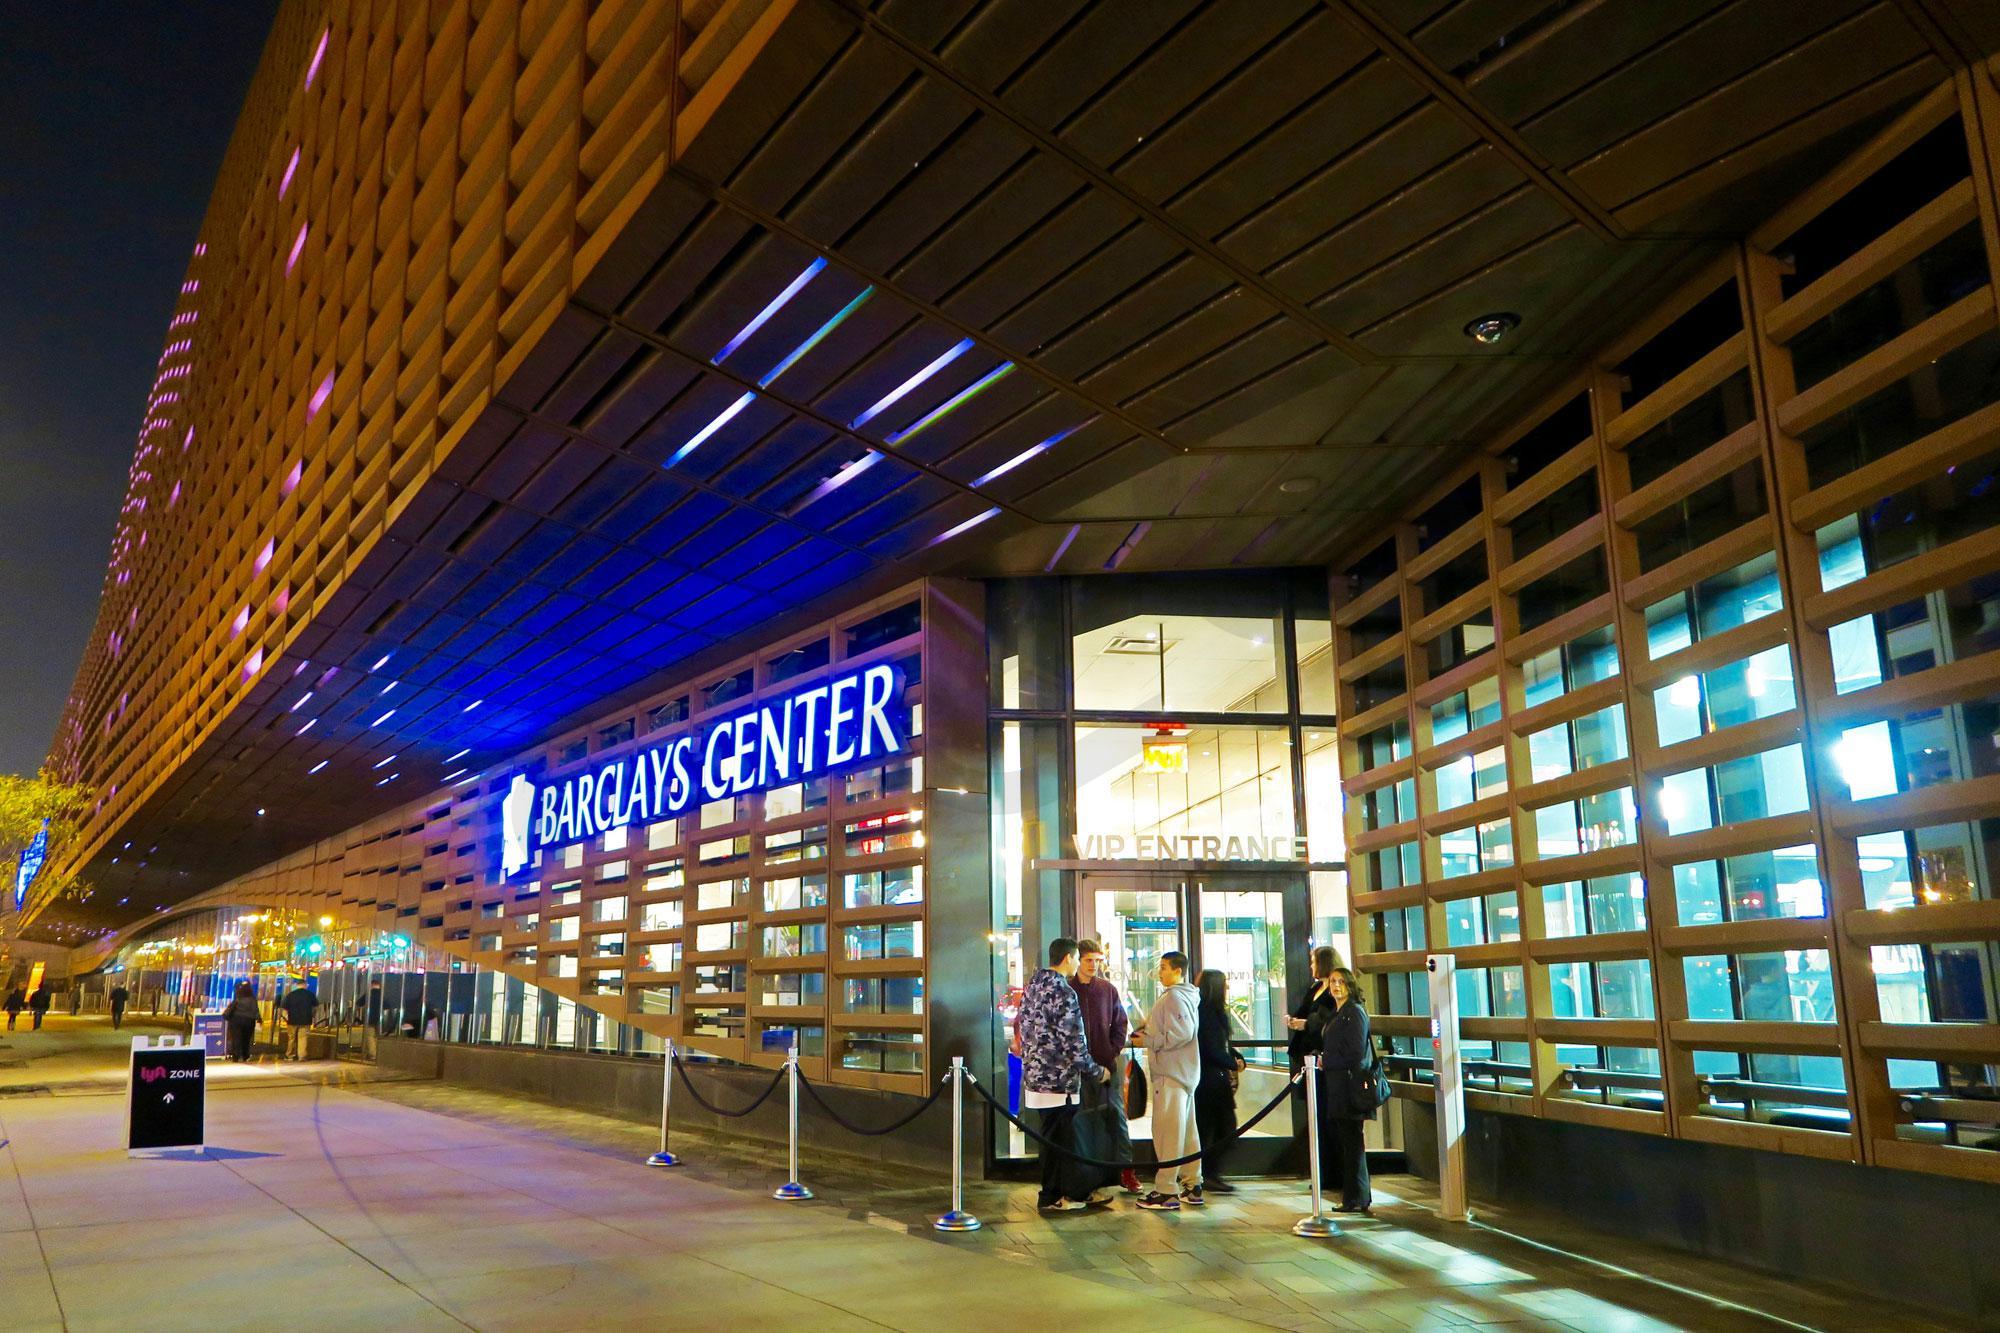 Barclays Center VIP Entrance